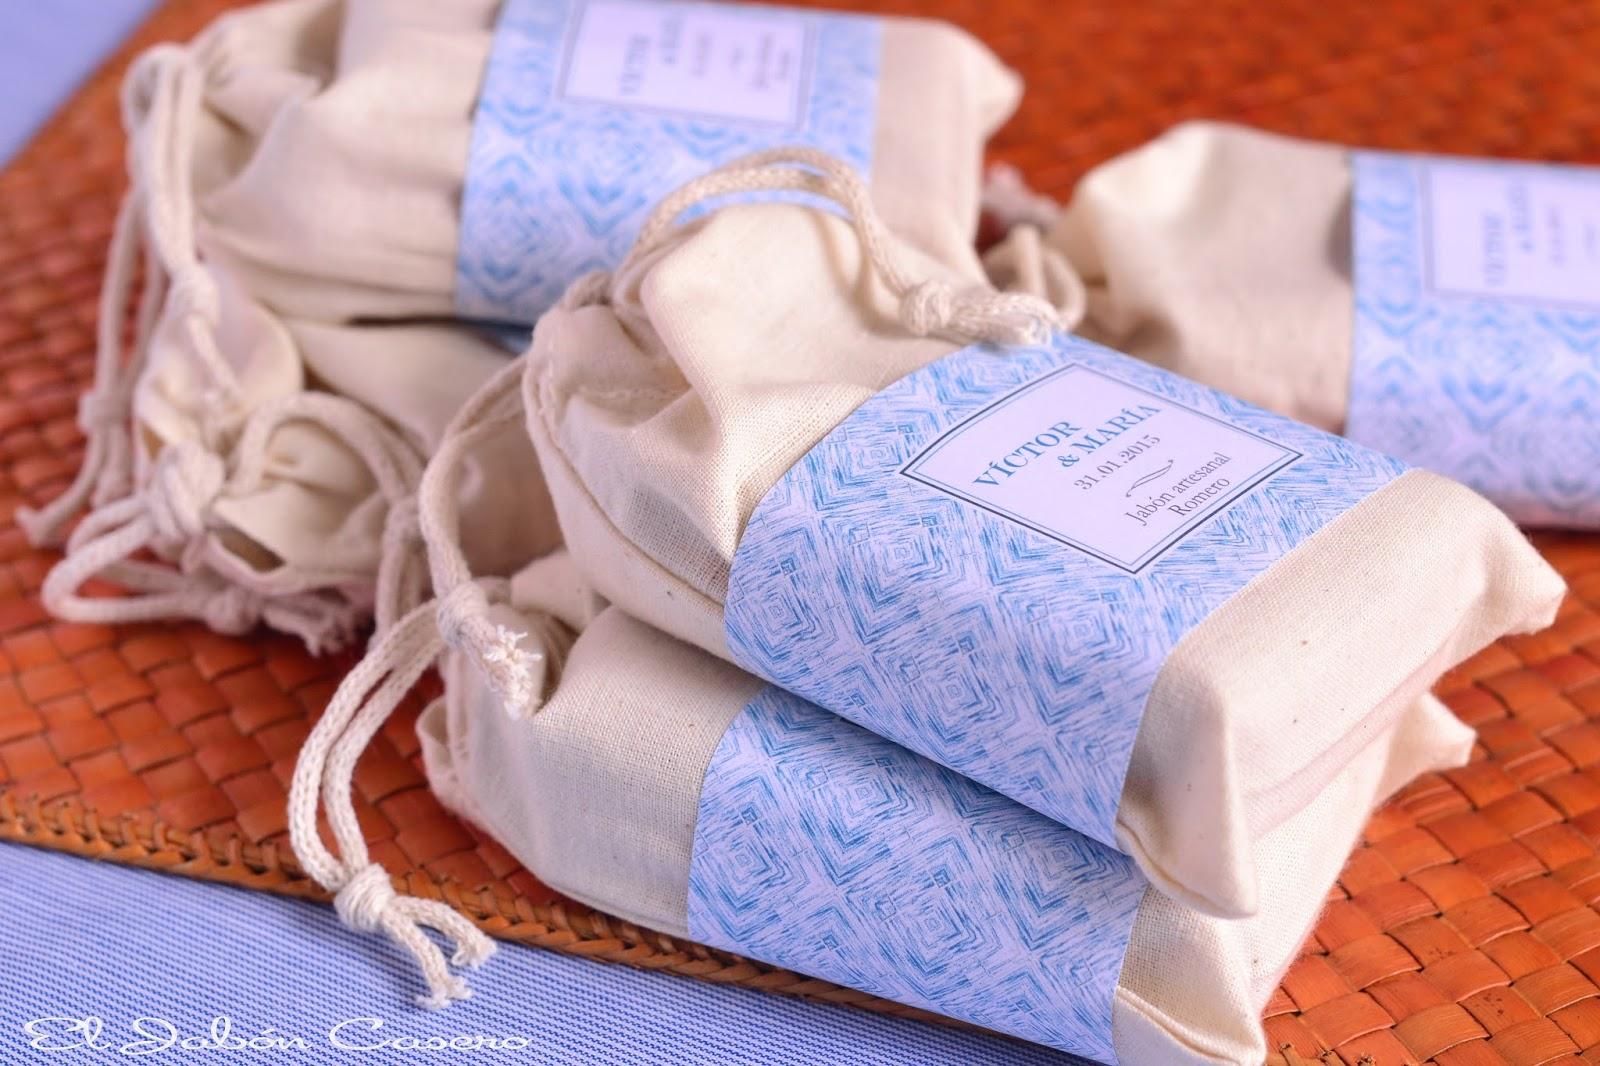 detalles de boda para hombres bolsitas con jabones naturales de romero